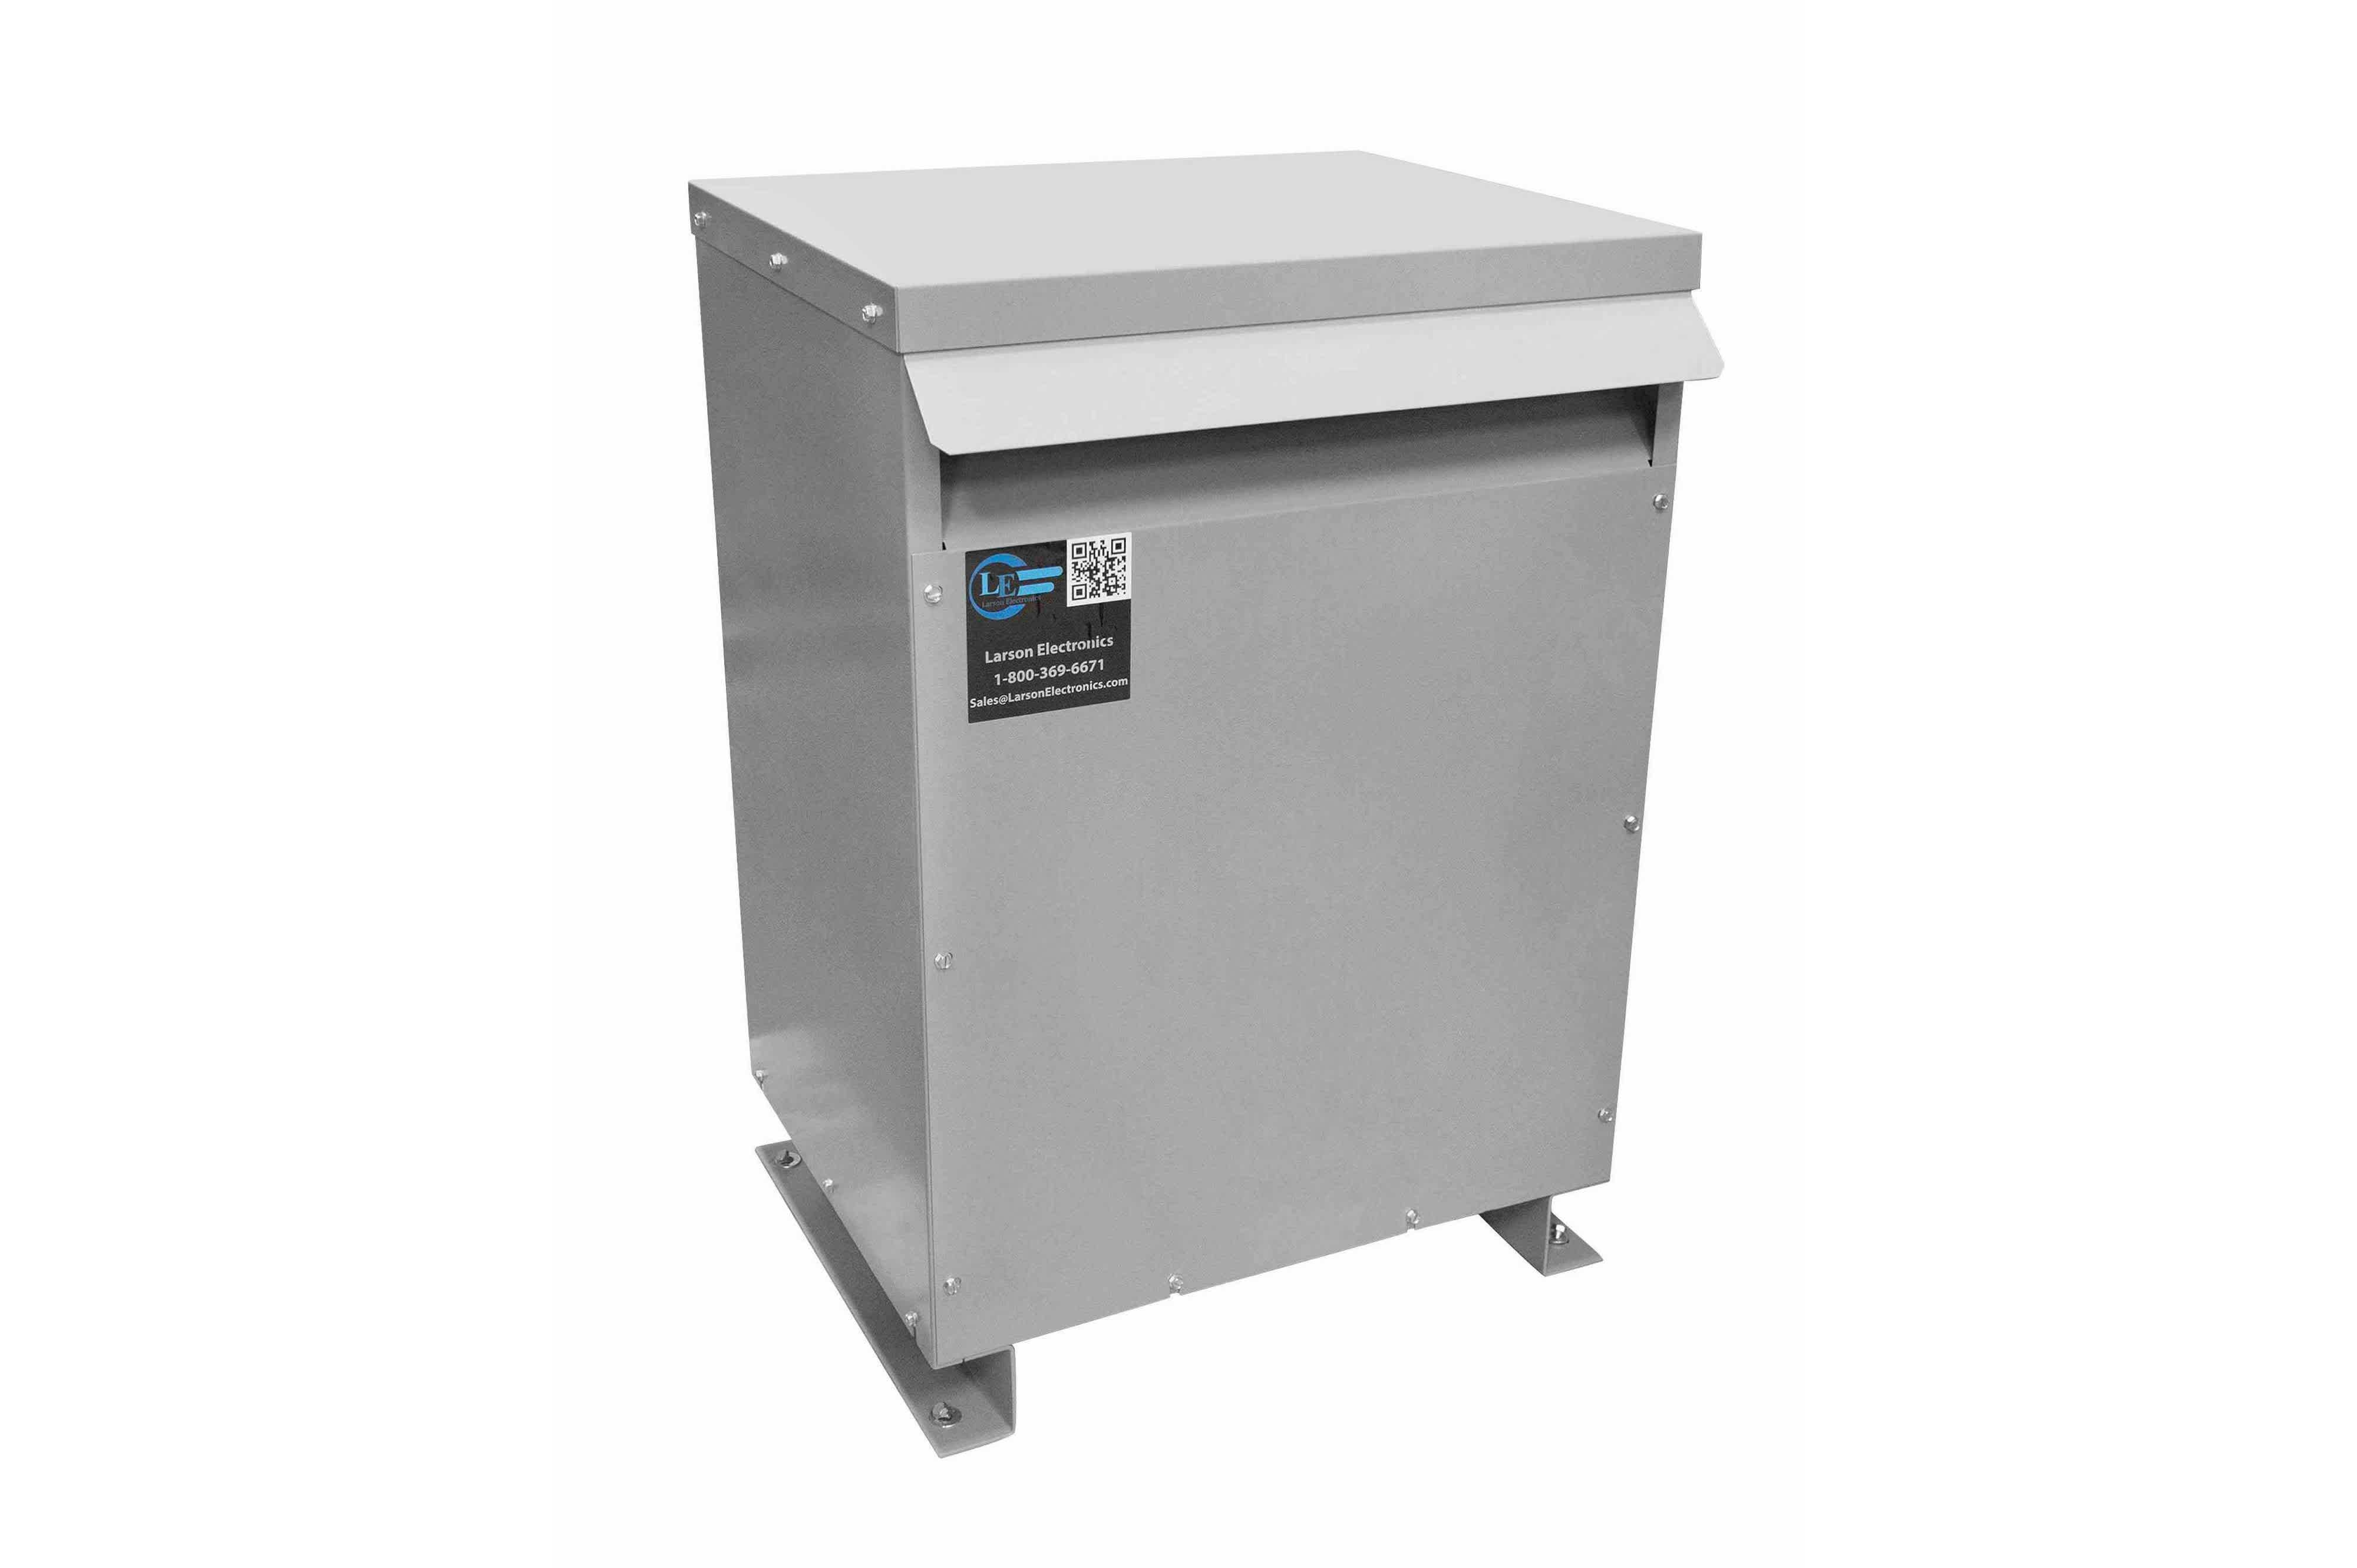 237.5 kVA 3PH Isolation Transformer, 460V Wye Primary, 415Y/240 Wye-N Secondary, N3R, Ventilated, 60 Hz